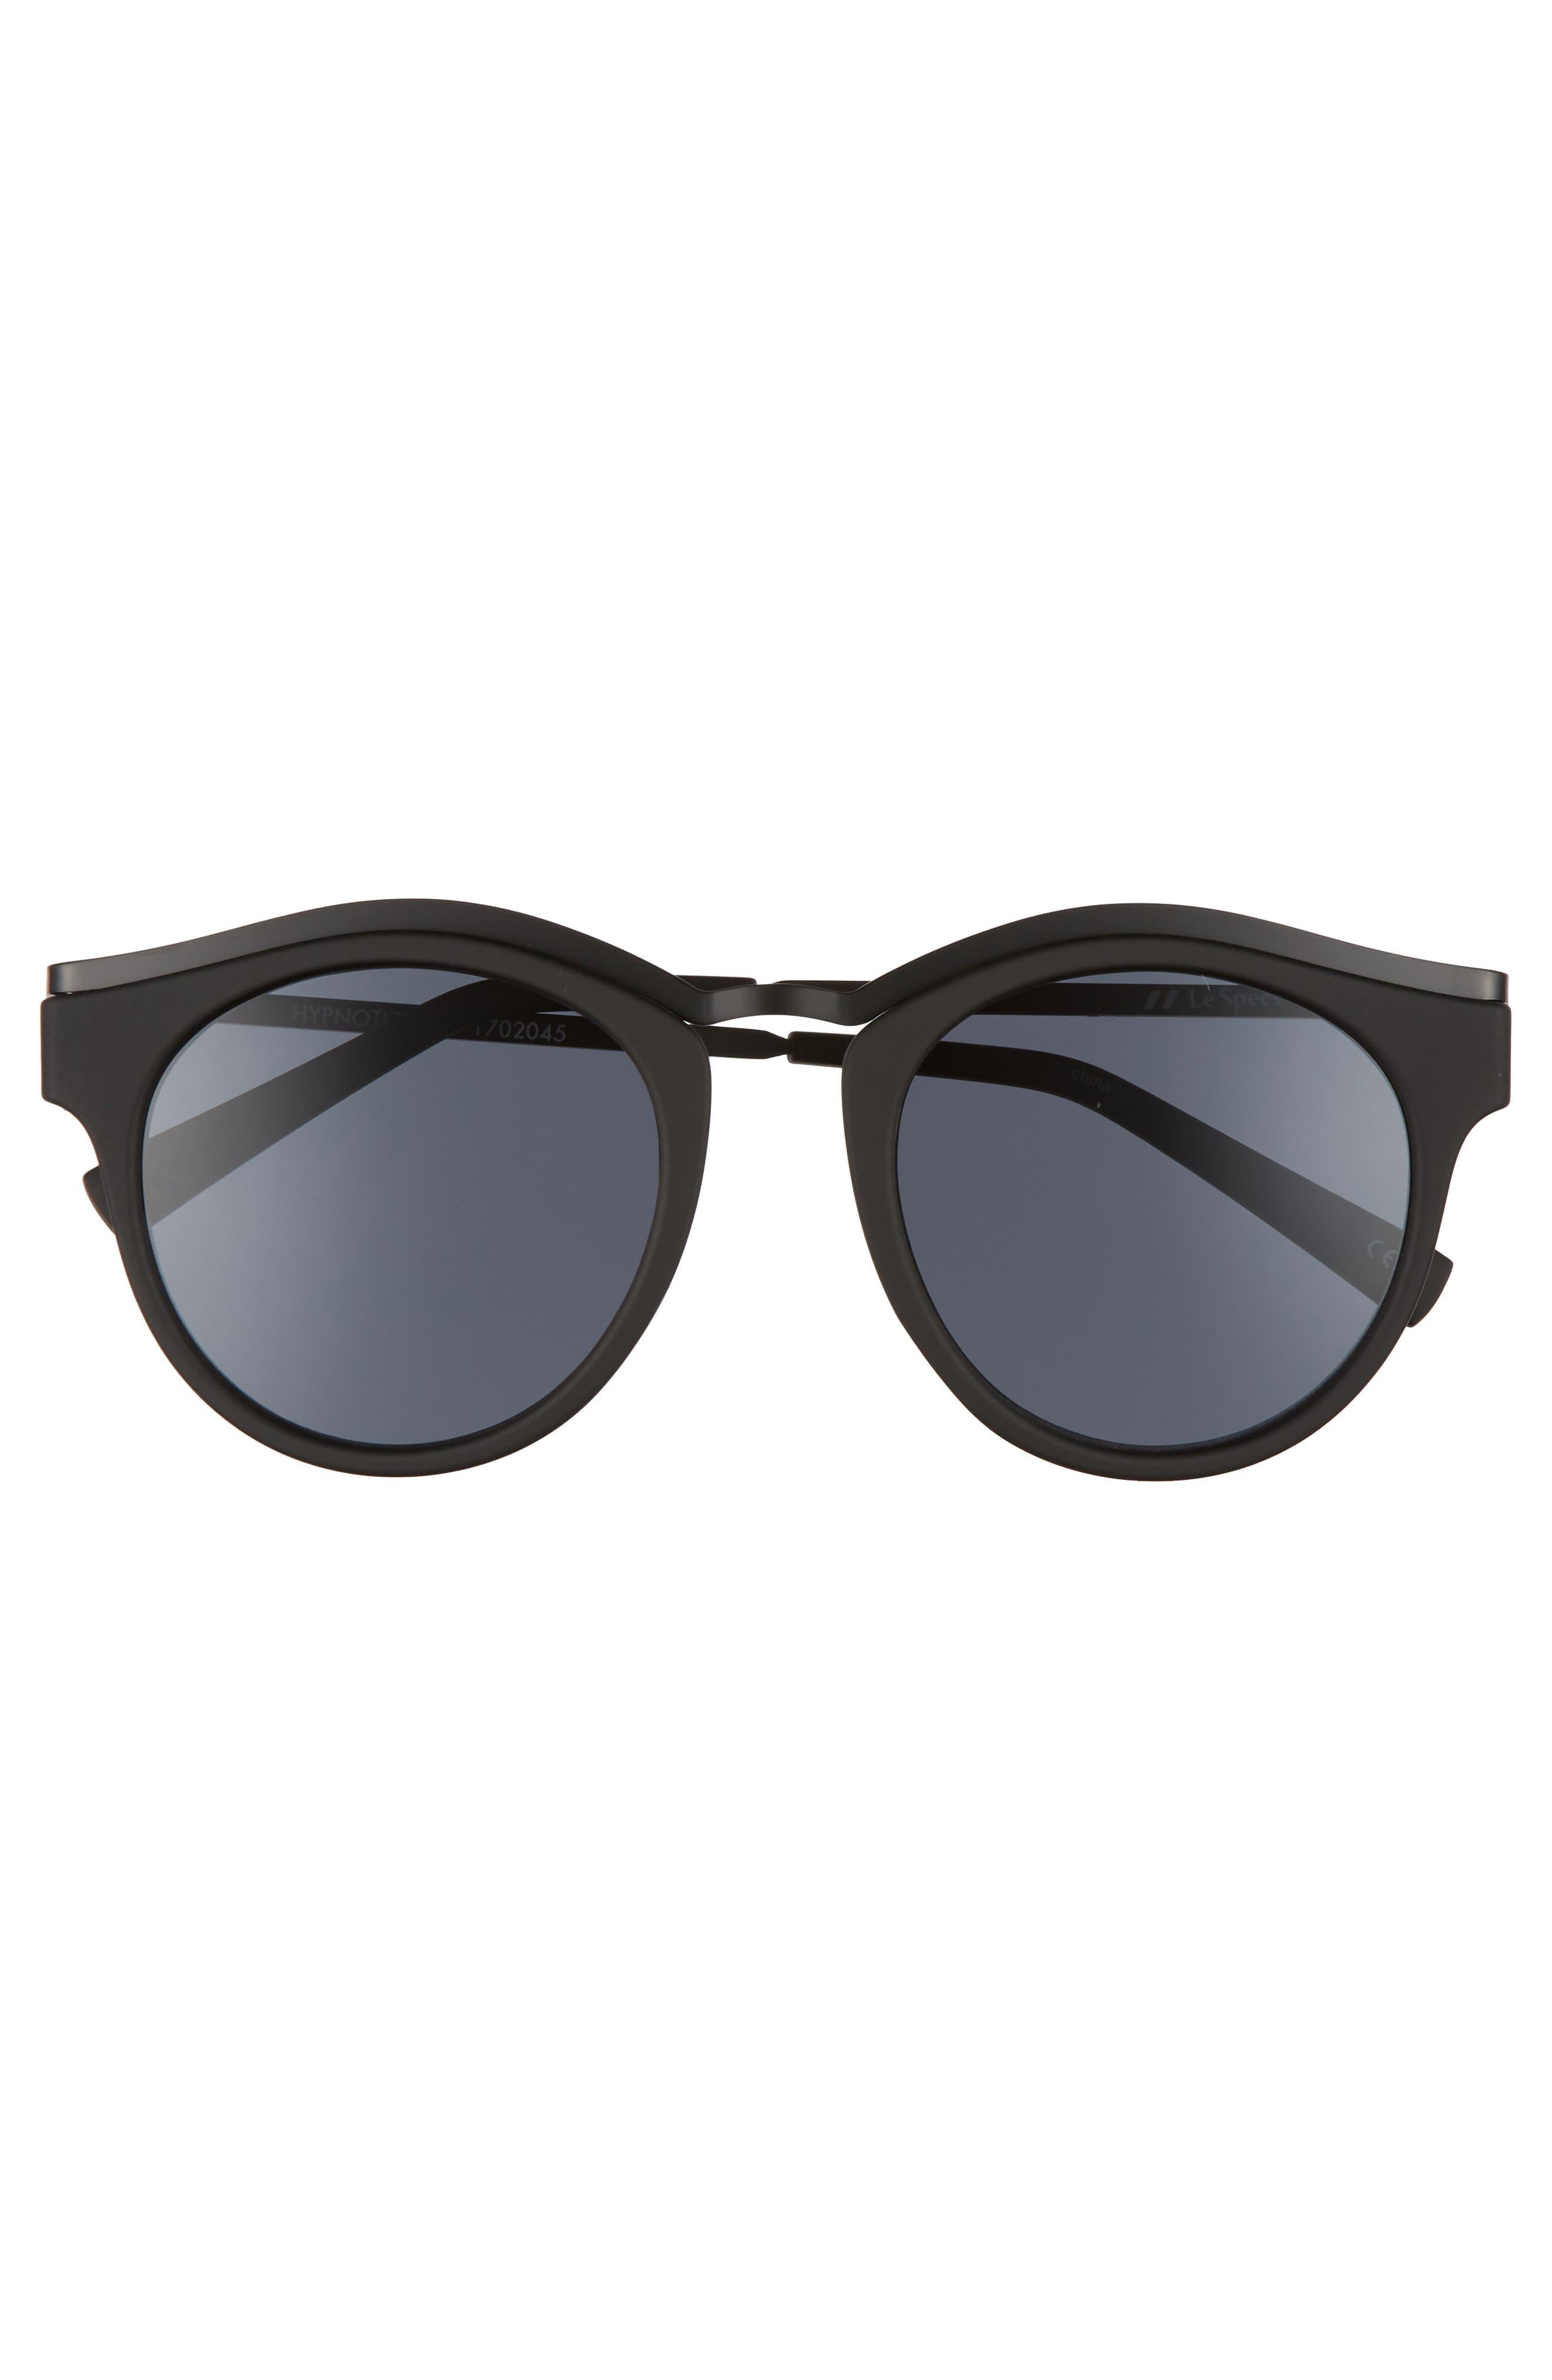 Hypnotize 50mm Round Sunglasses,                             Alternate thumbnail 3, color,                             Black Rubber